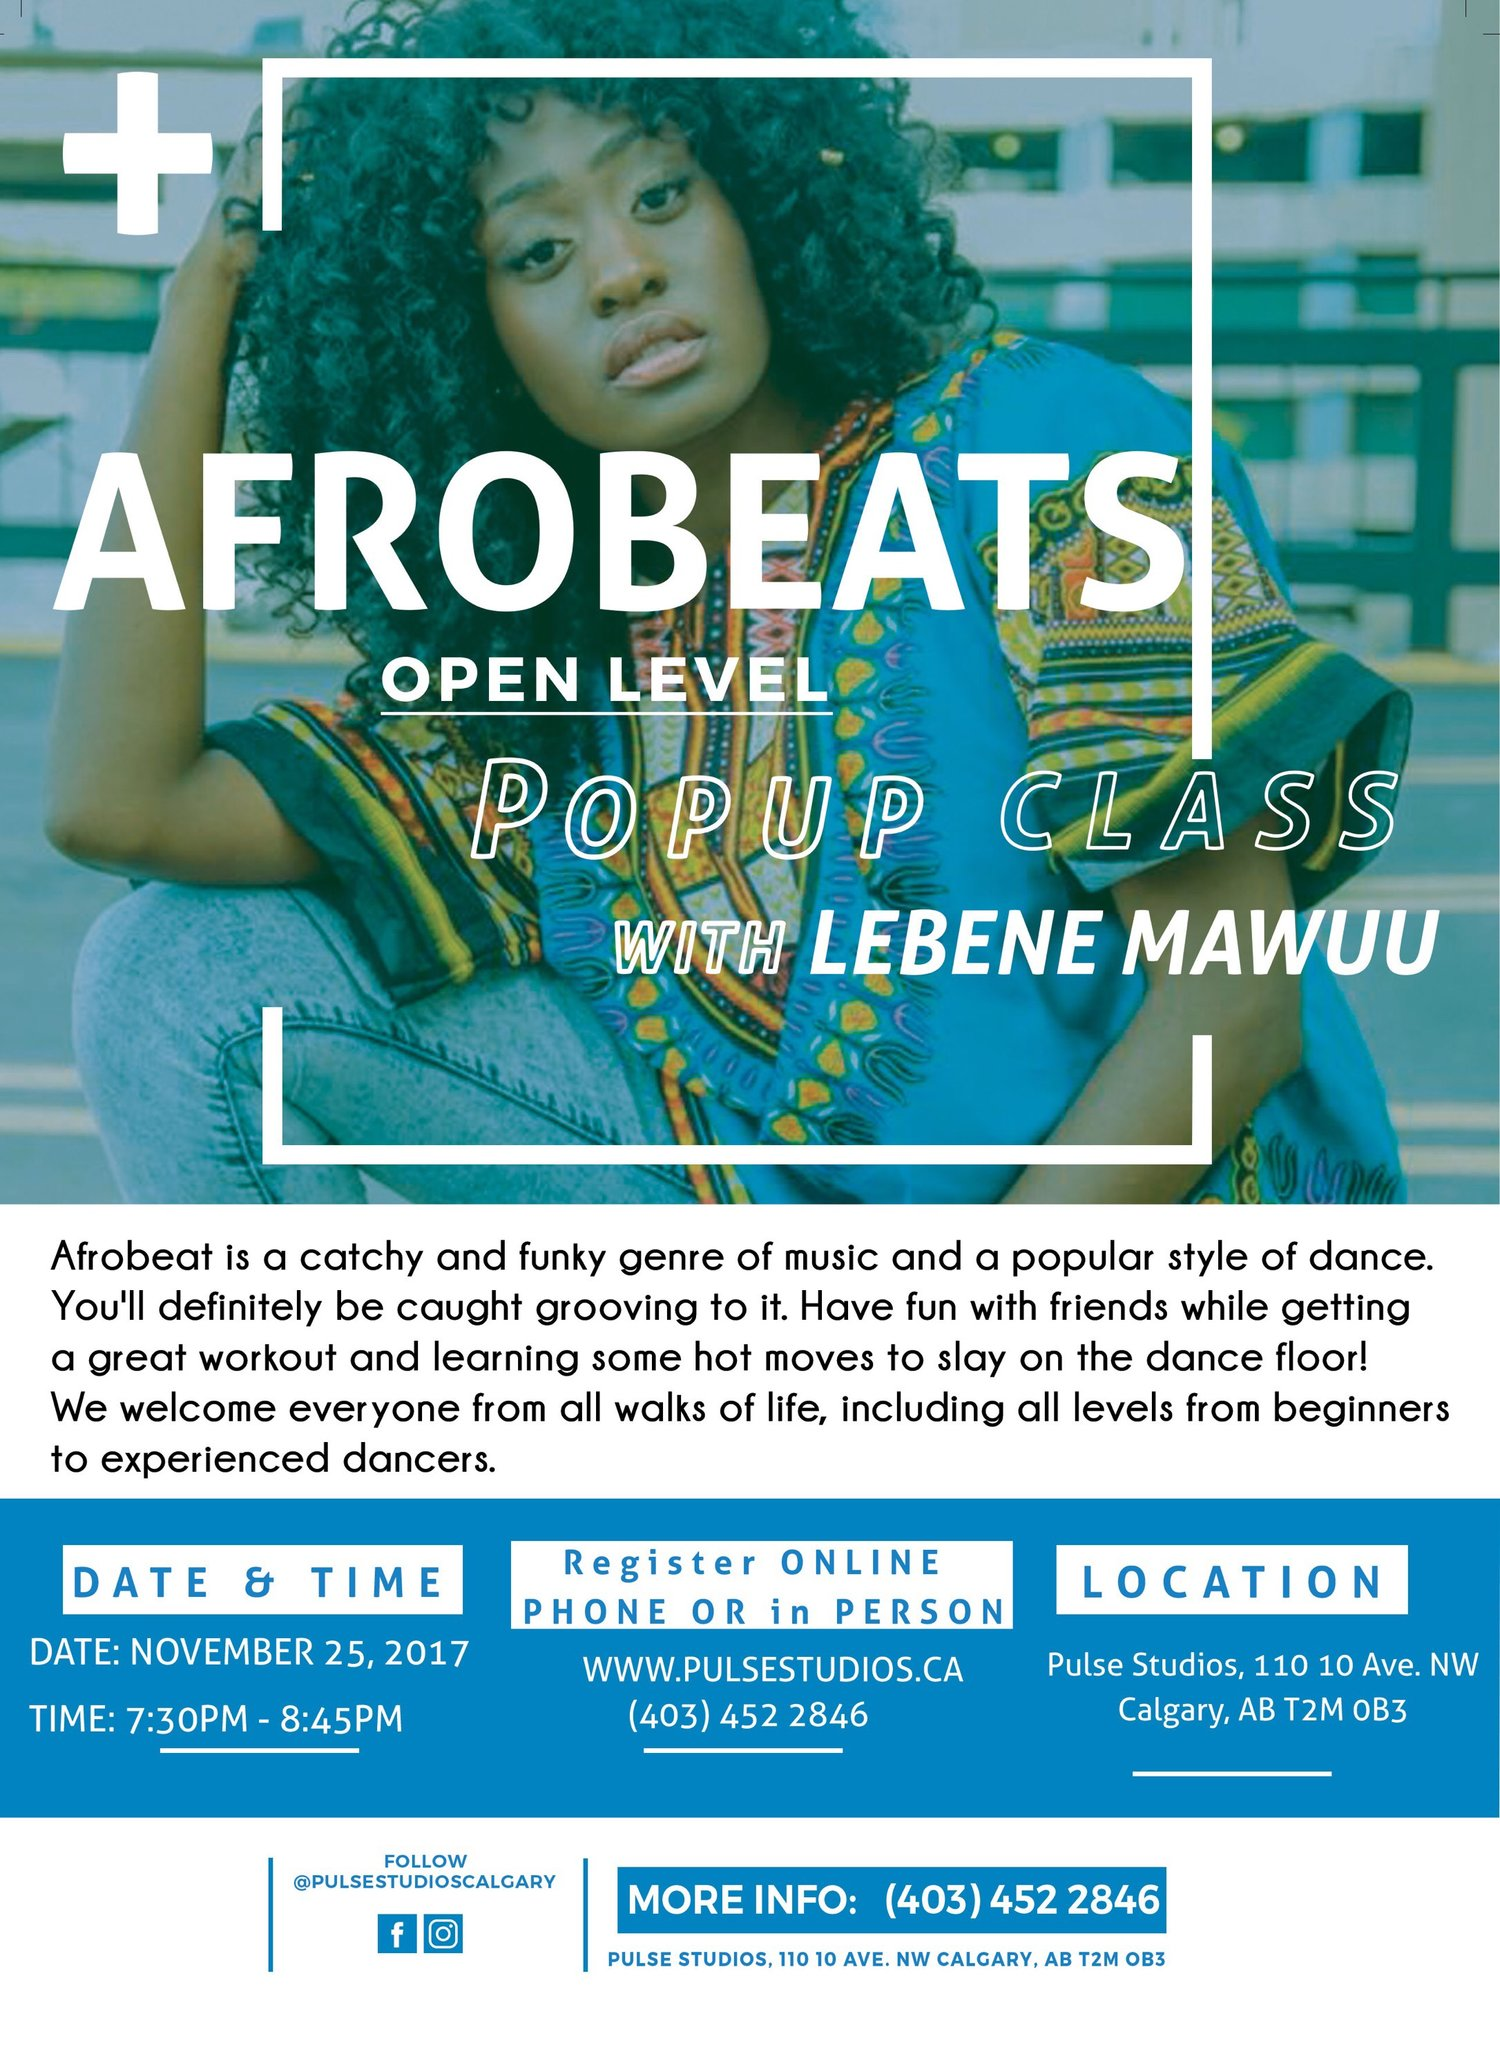 Afrobeats POP up class — Pulse Studios